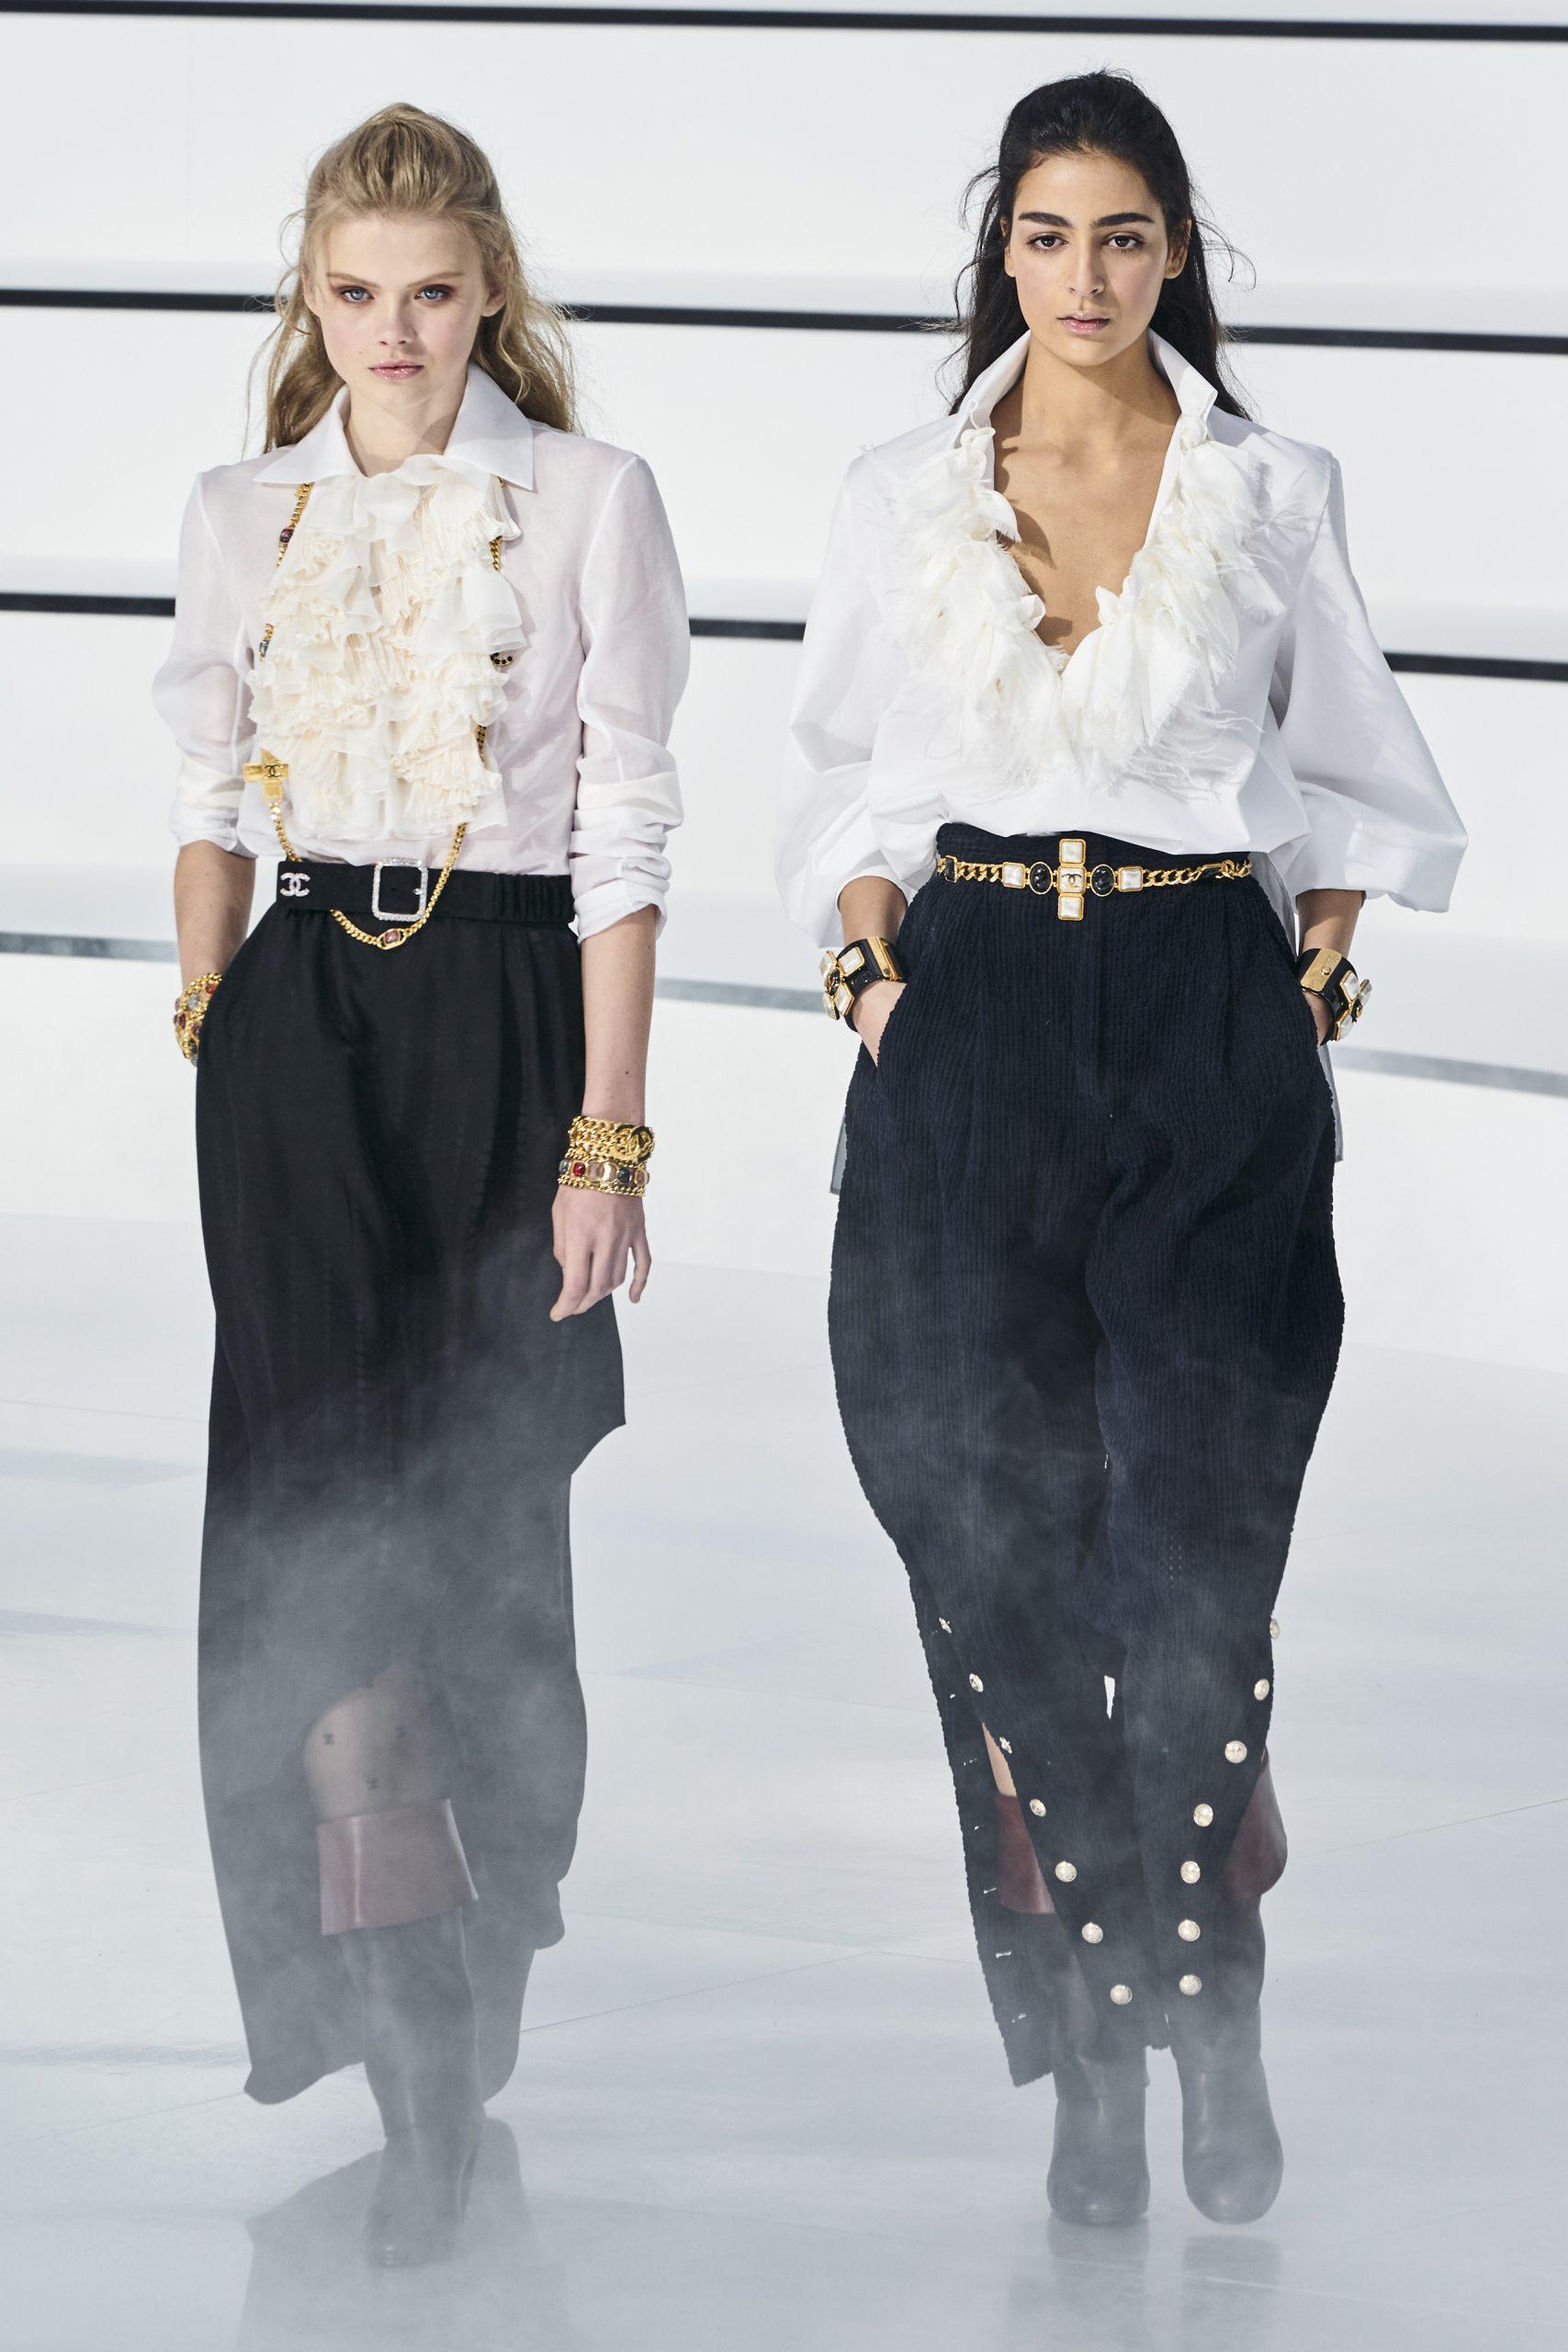 Desfile otoño-invierno 20/21 de Chanel/Foto: Imaxtree.